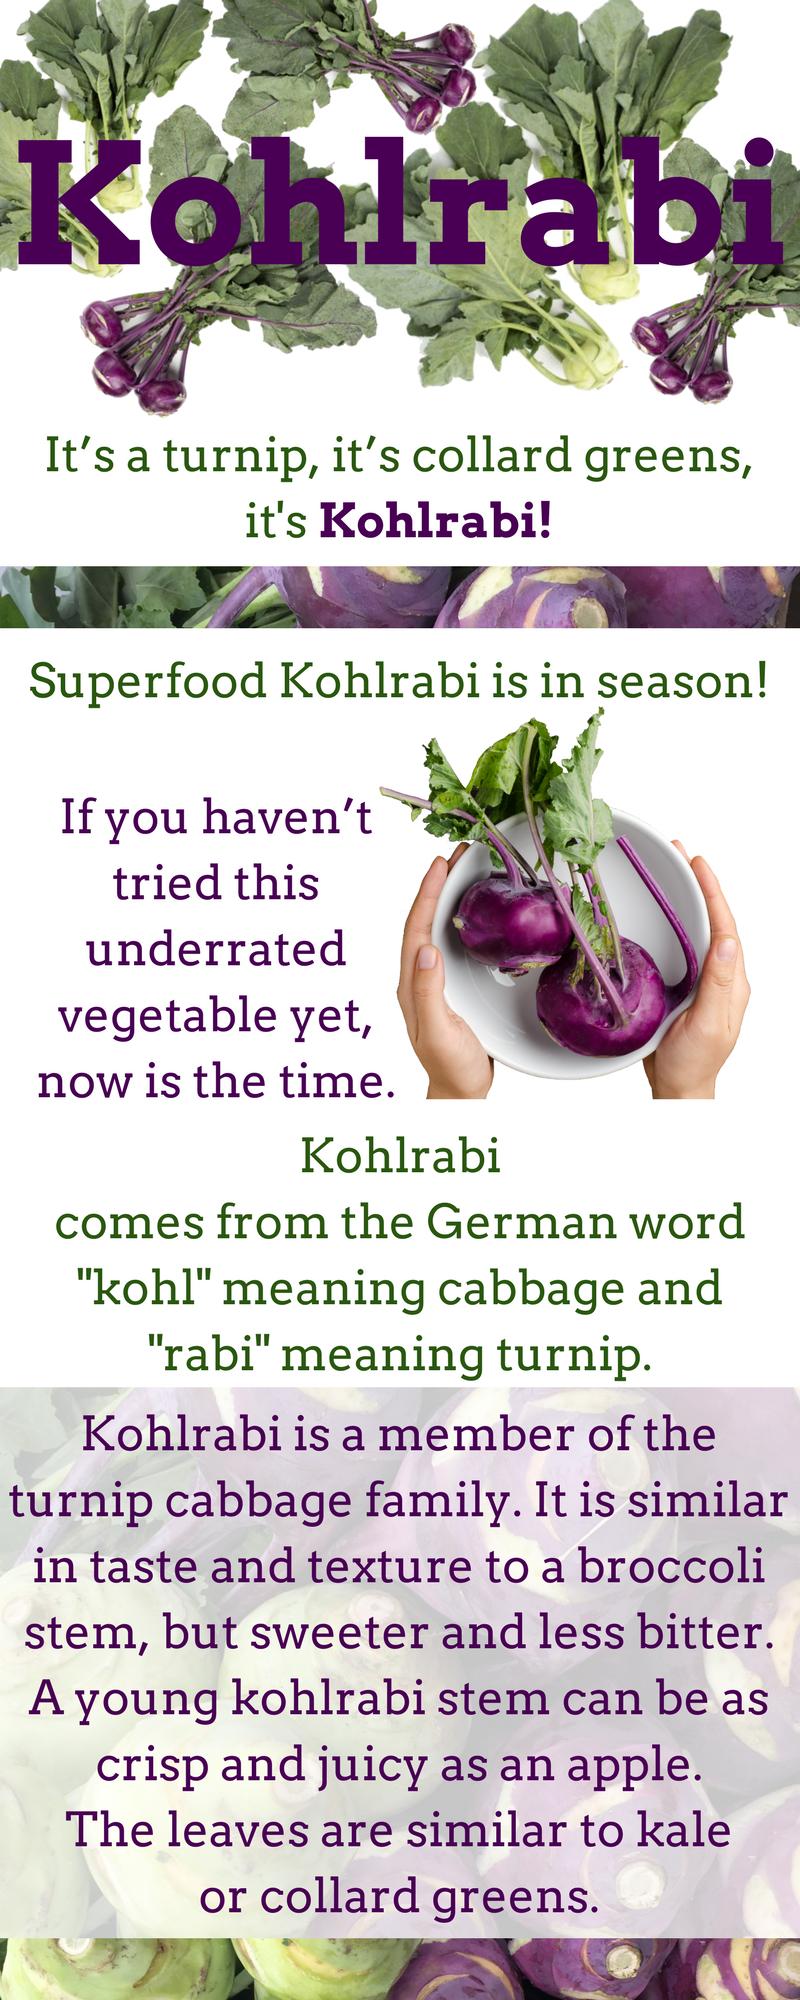 KohlrabiPost1.png